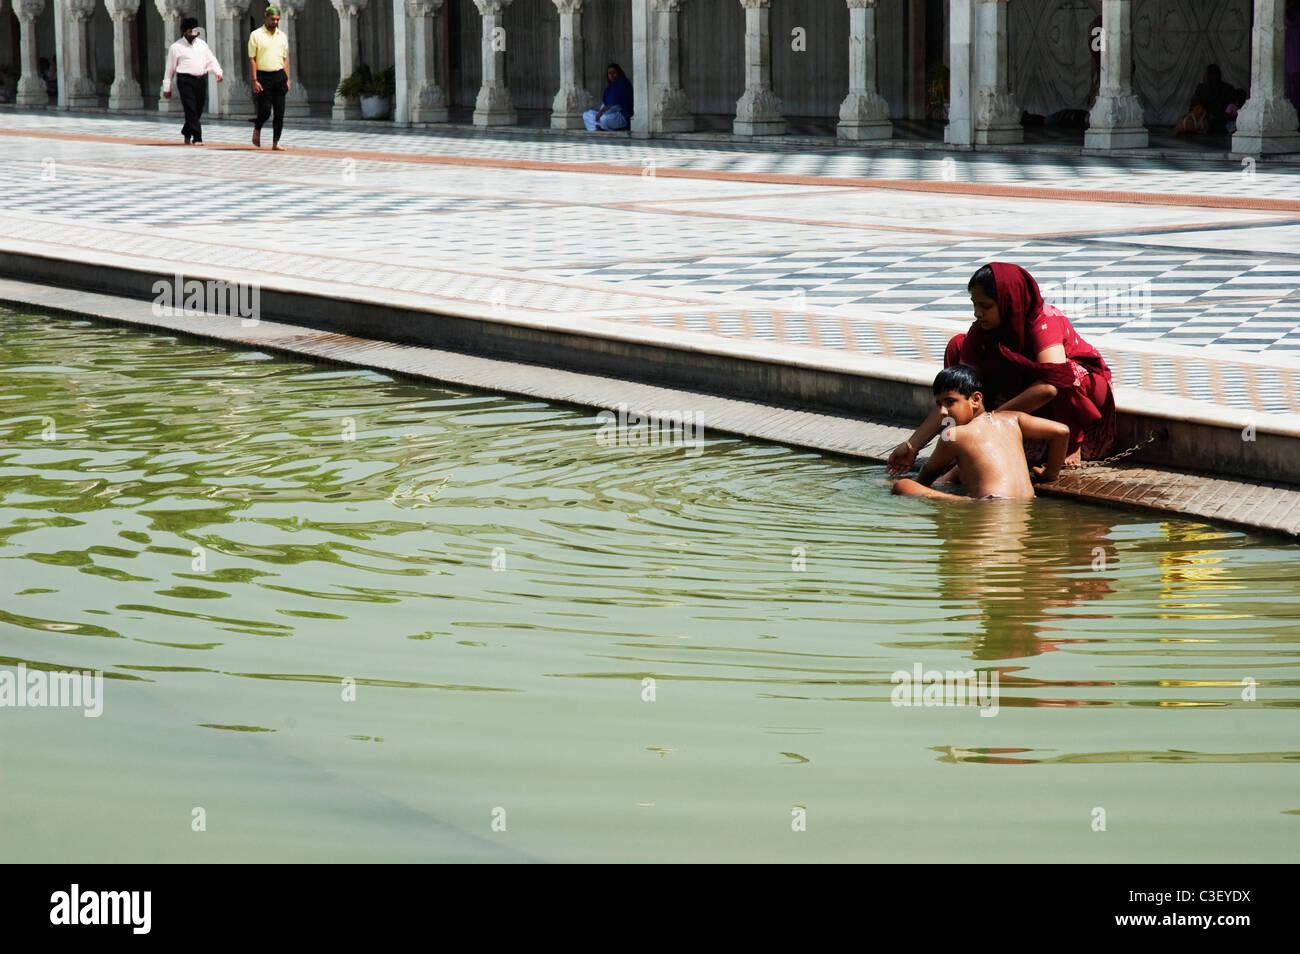 Woman getting her son bath in a pond at a gurudwara, Gurudwara Bangla Sahib, New Delhi, India Stock Photo